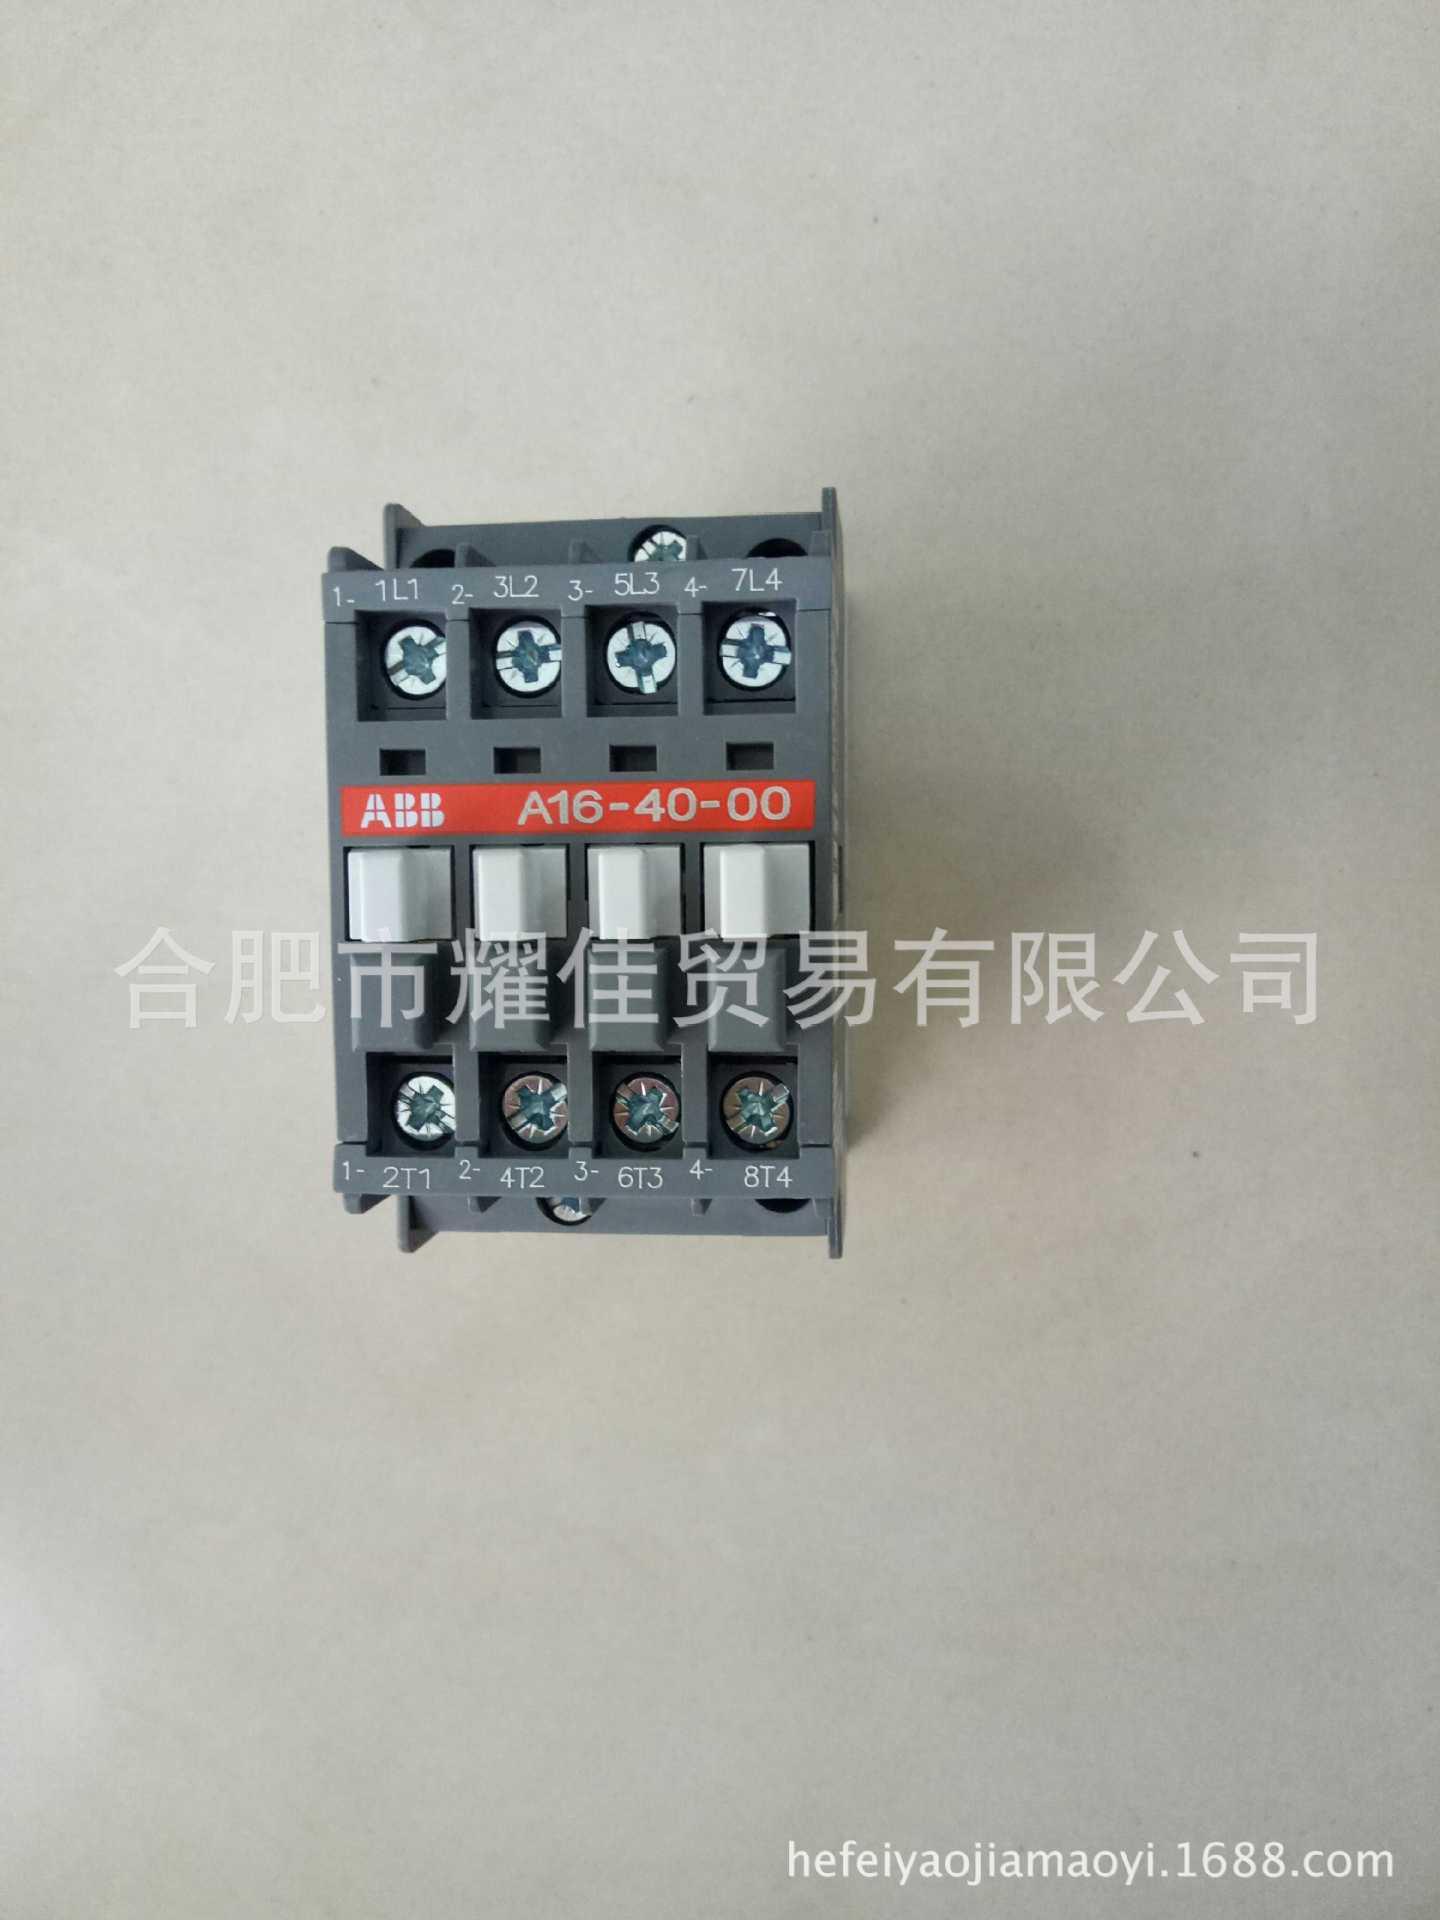 abb原装正品交流接触器a16-40-00 线圈电压24v 110v 220v 380v